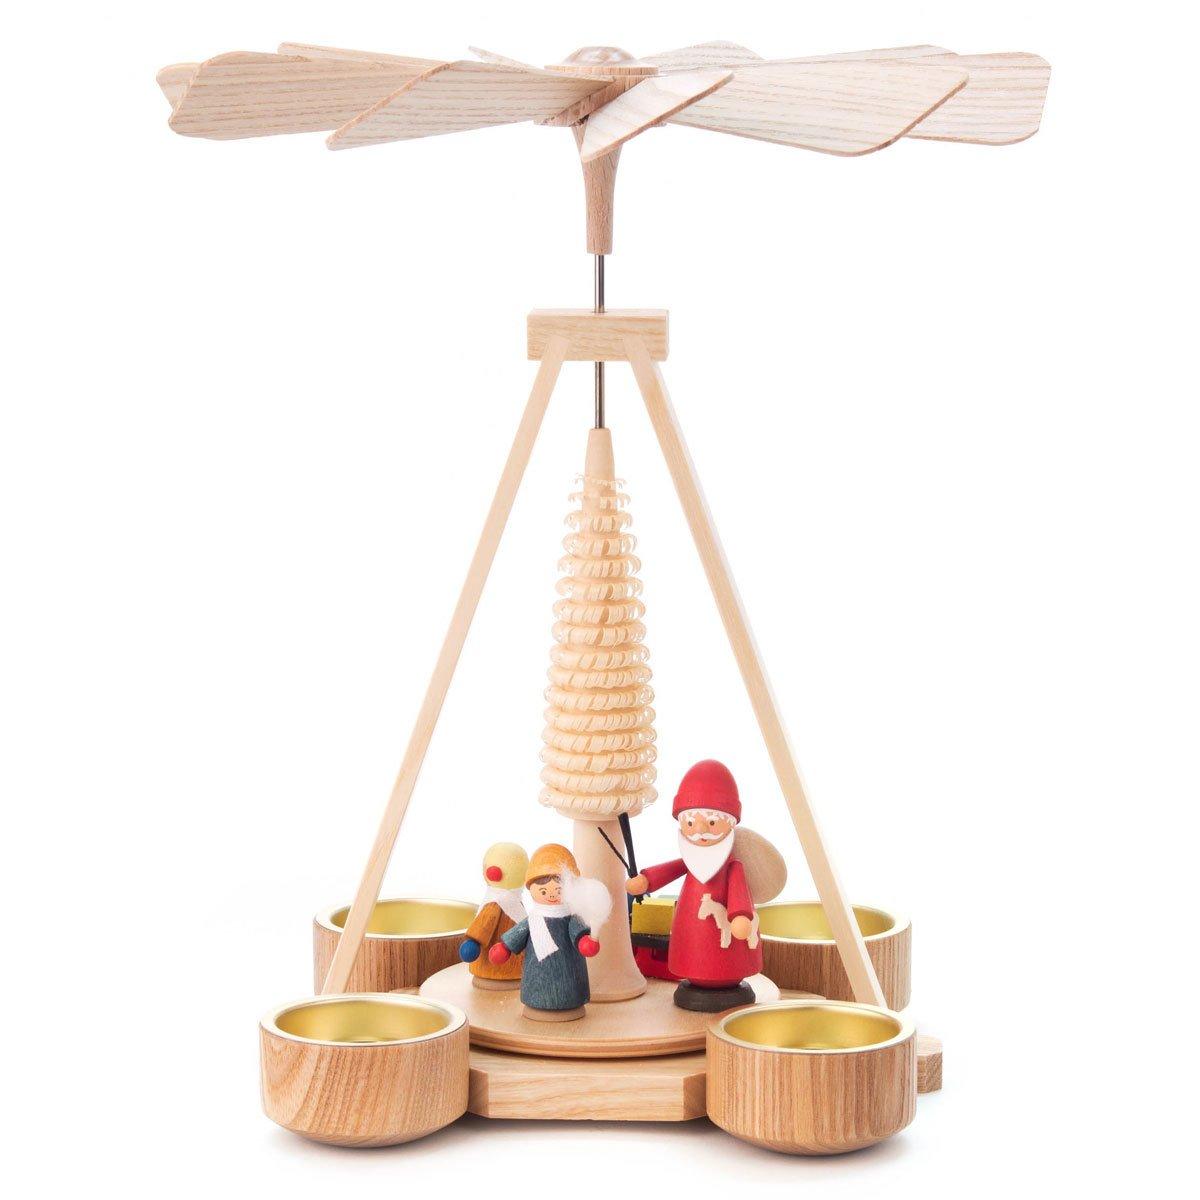 St. Nicholas's Workshop Tea Light Wood Christmas German Pyramid - Stands 9 3/4 Inches Tall - Christmas Carousel